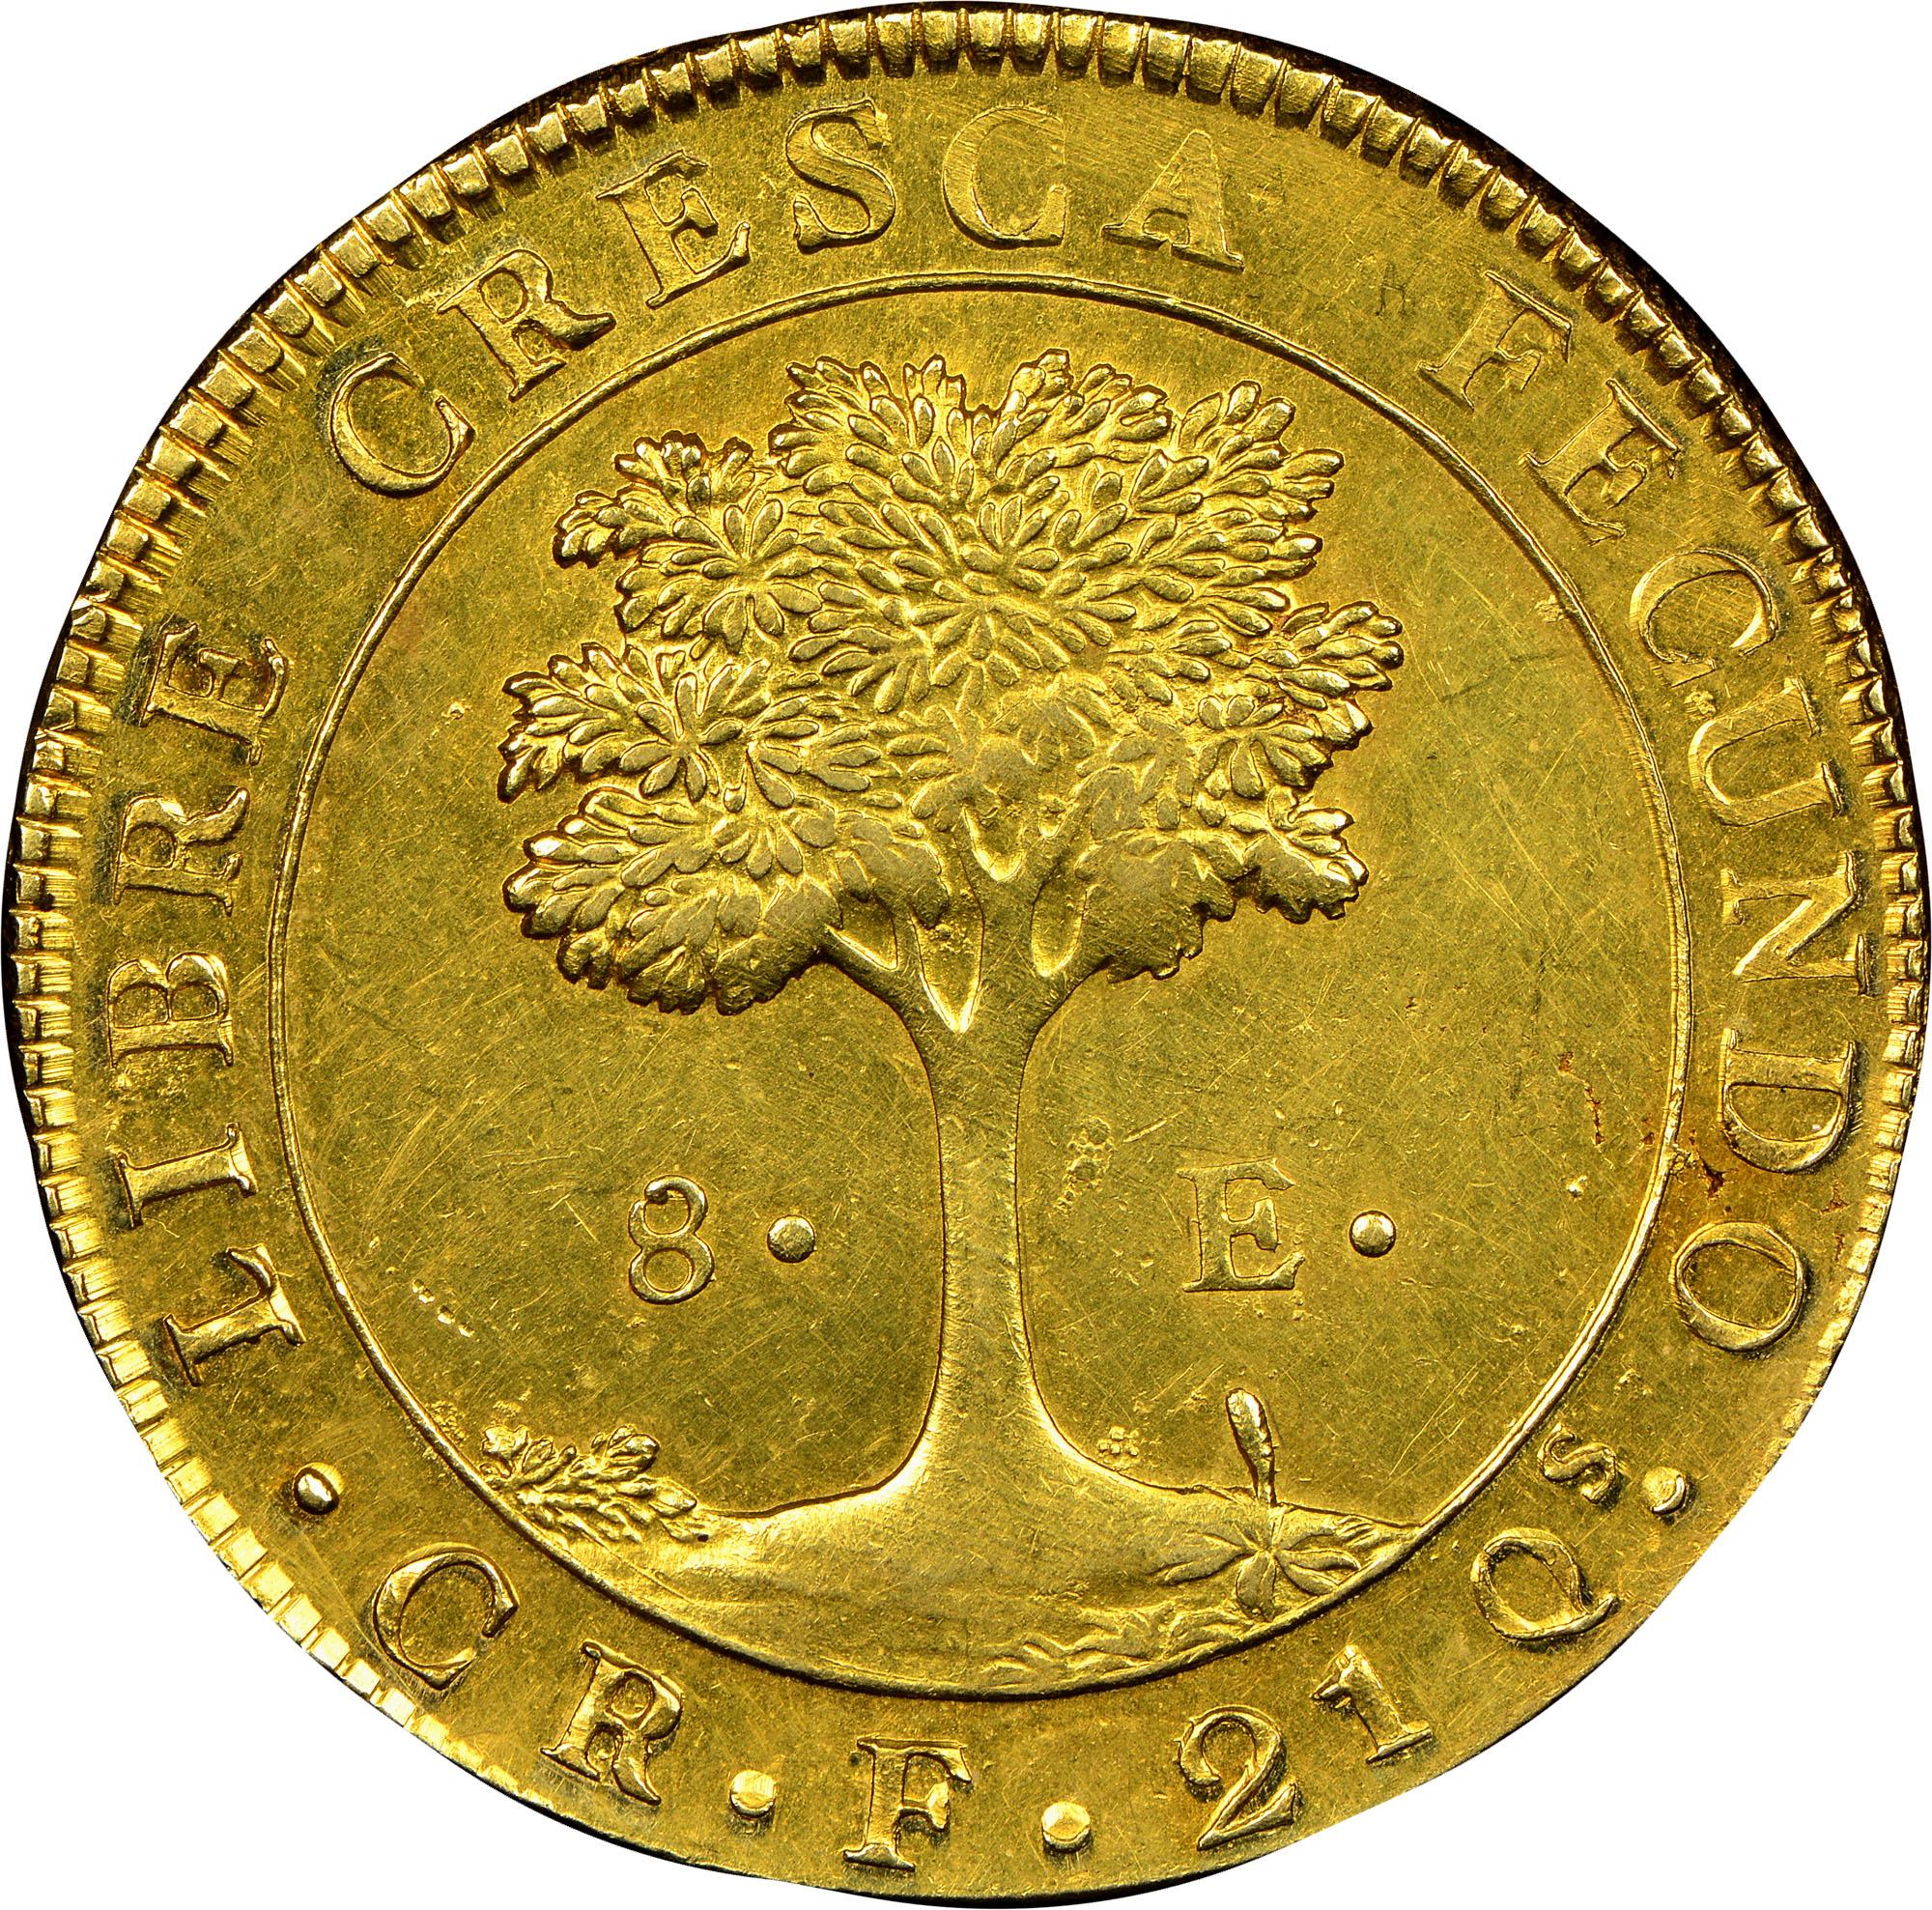 1828-1837 Central American Republic 8 Escudos reverse